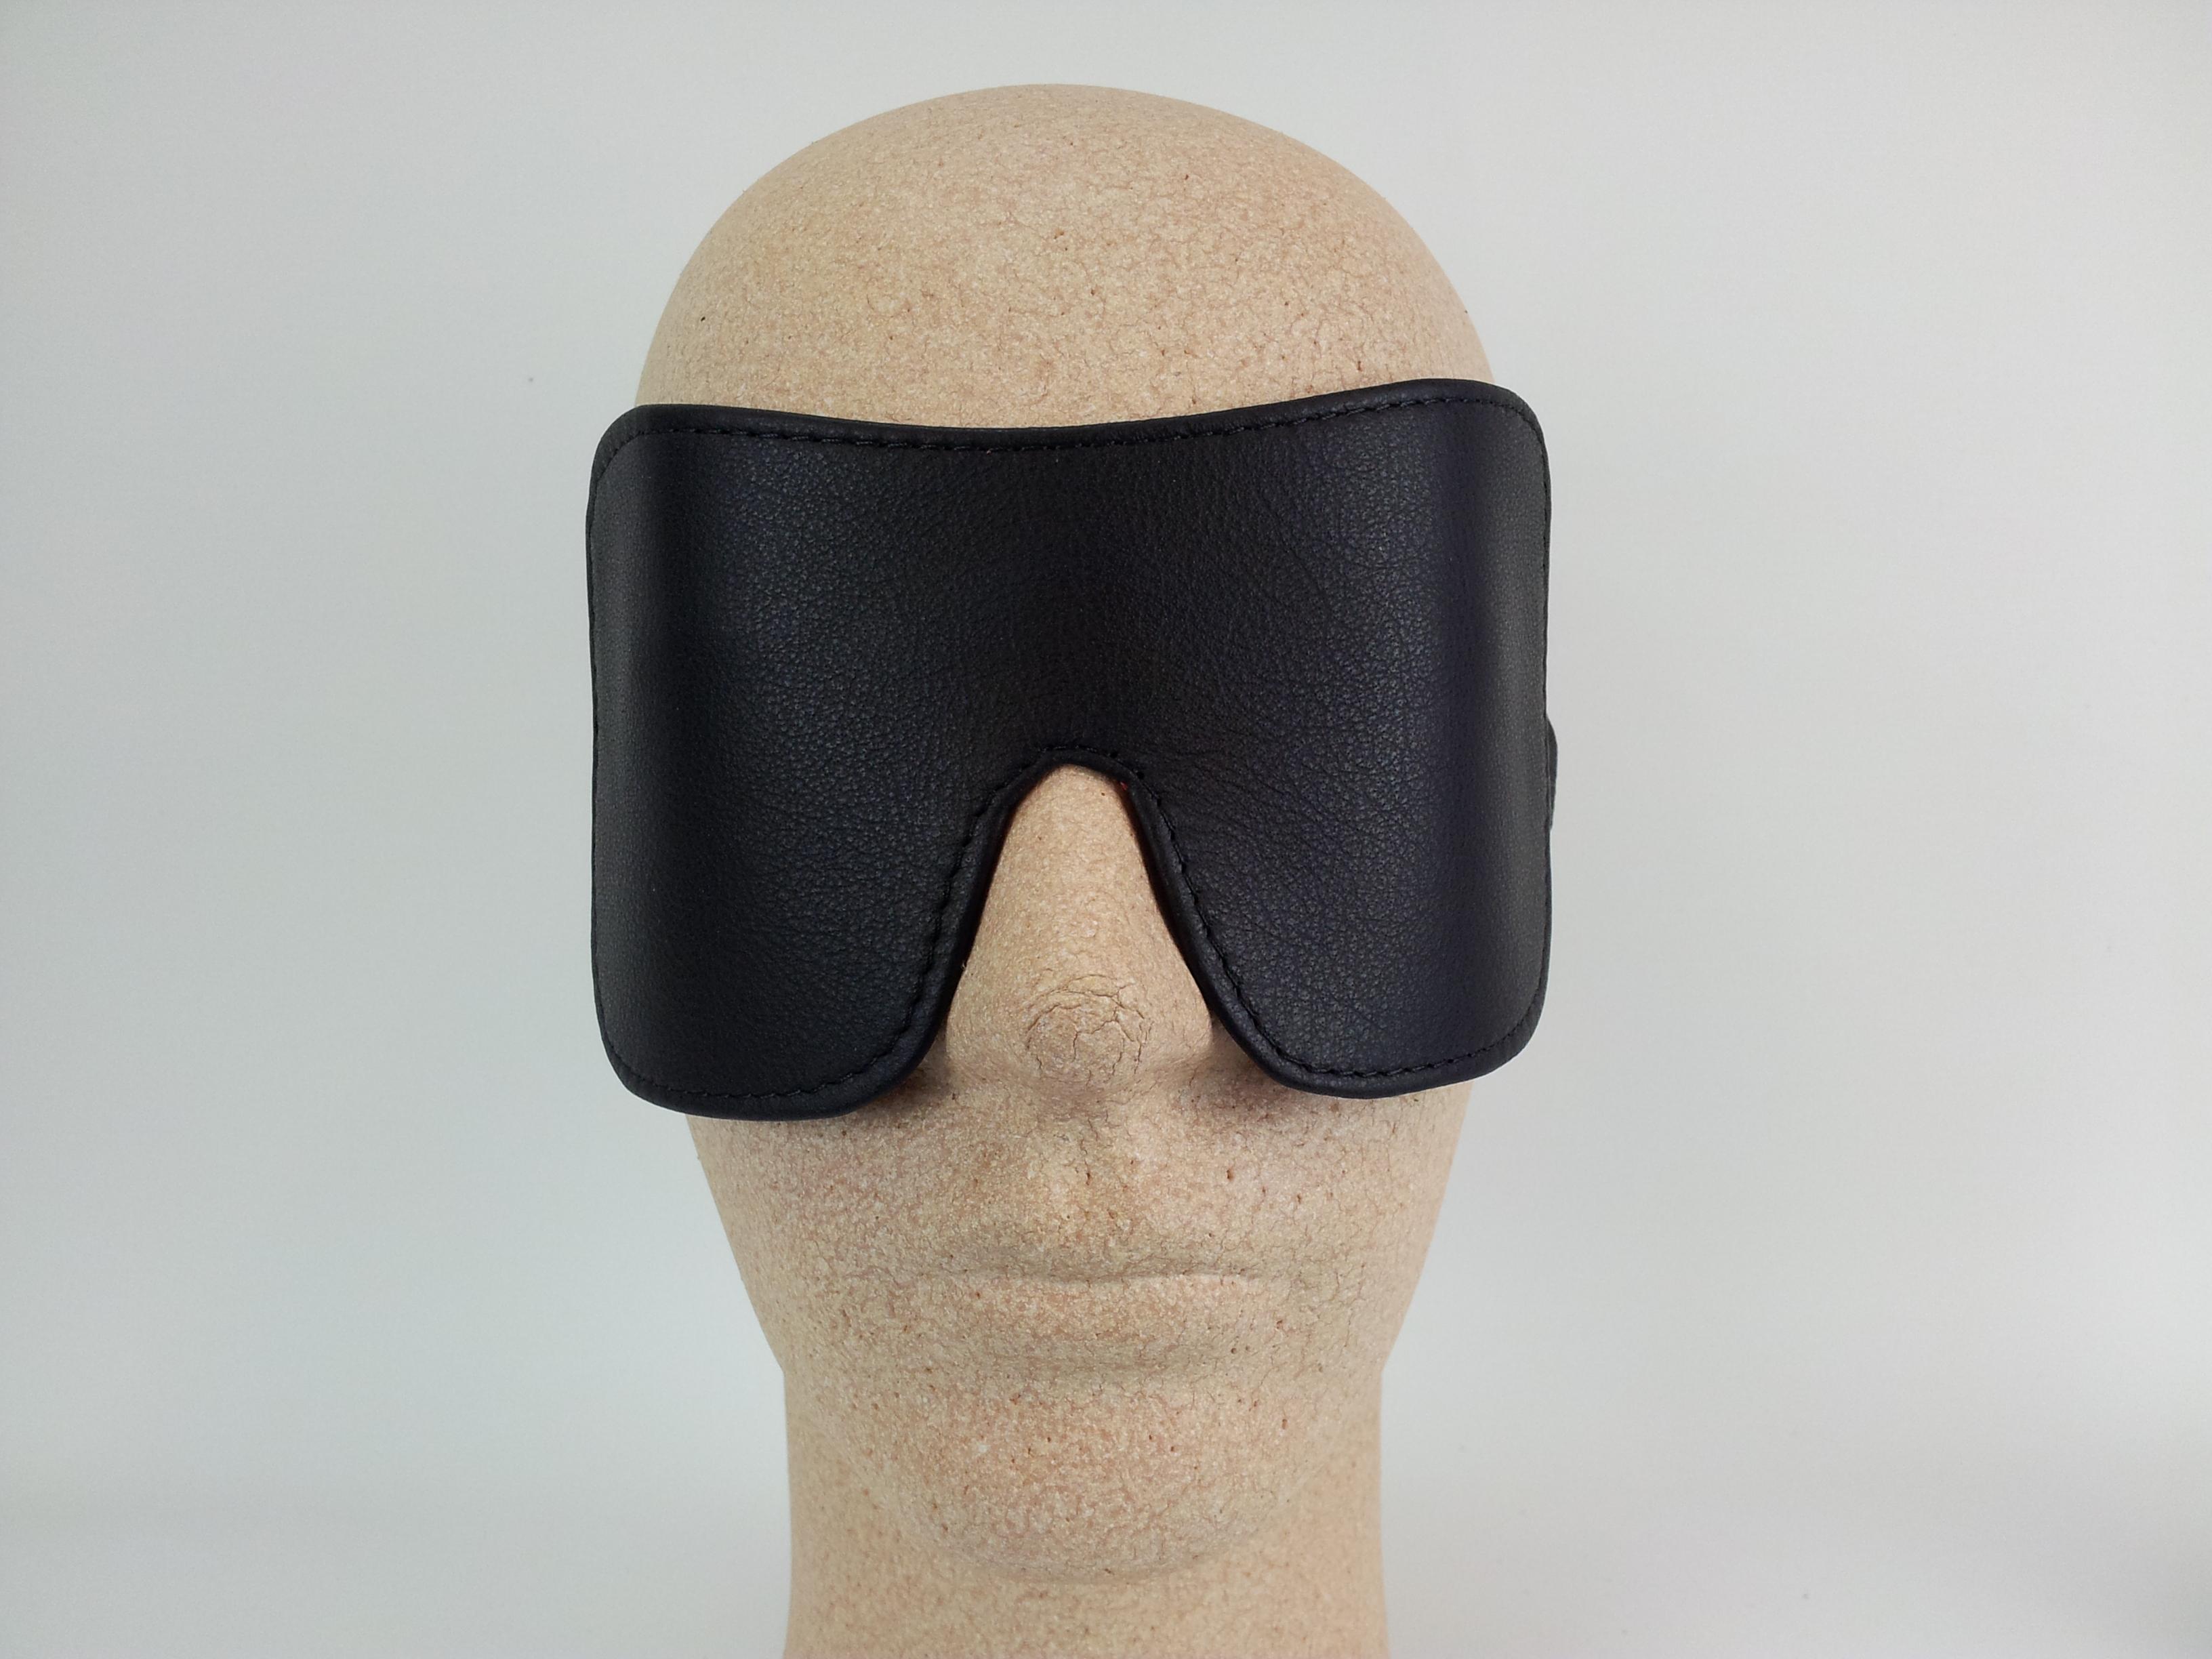 AC/blinddoek 1